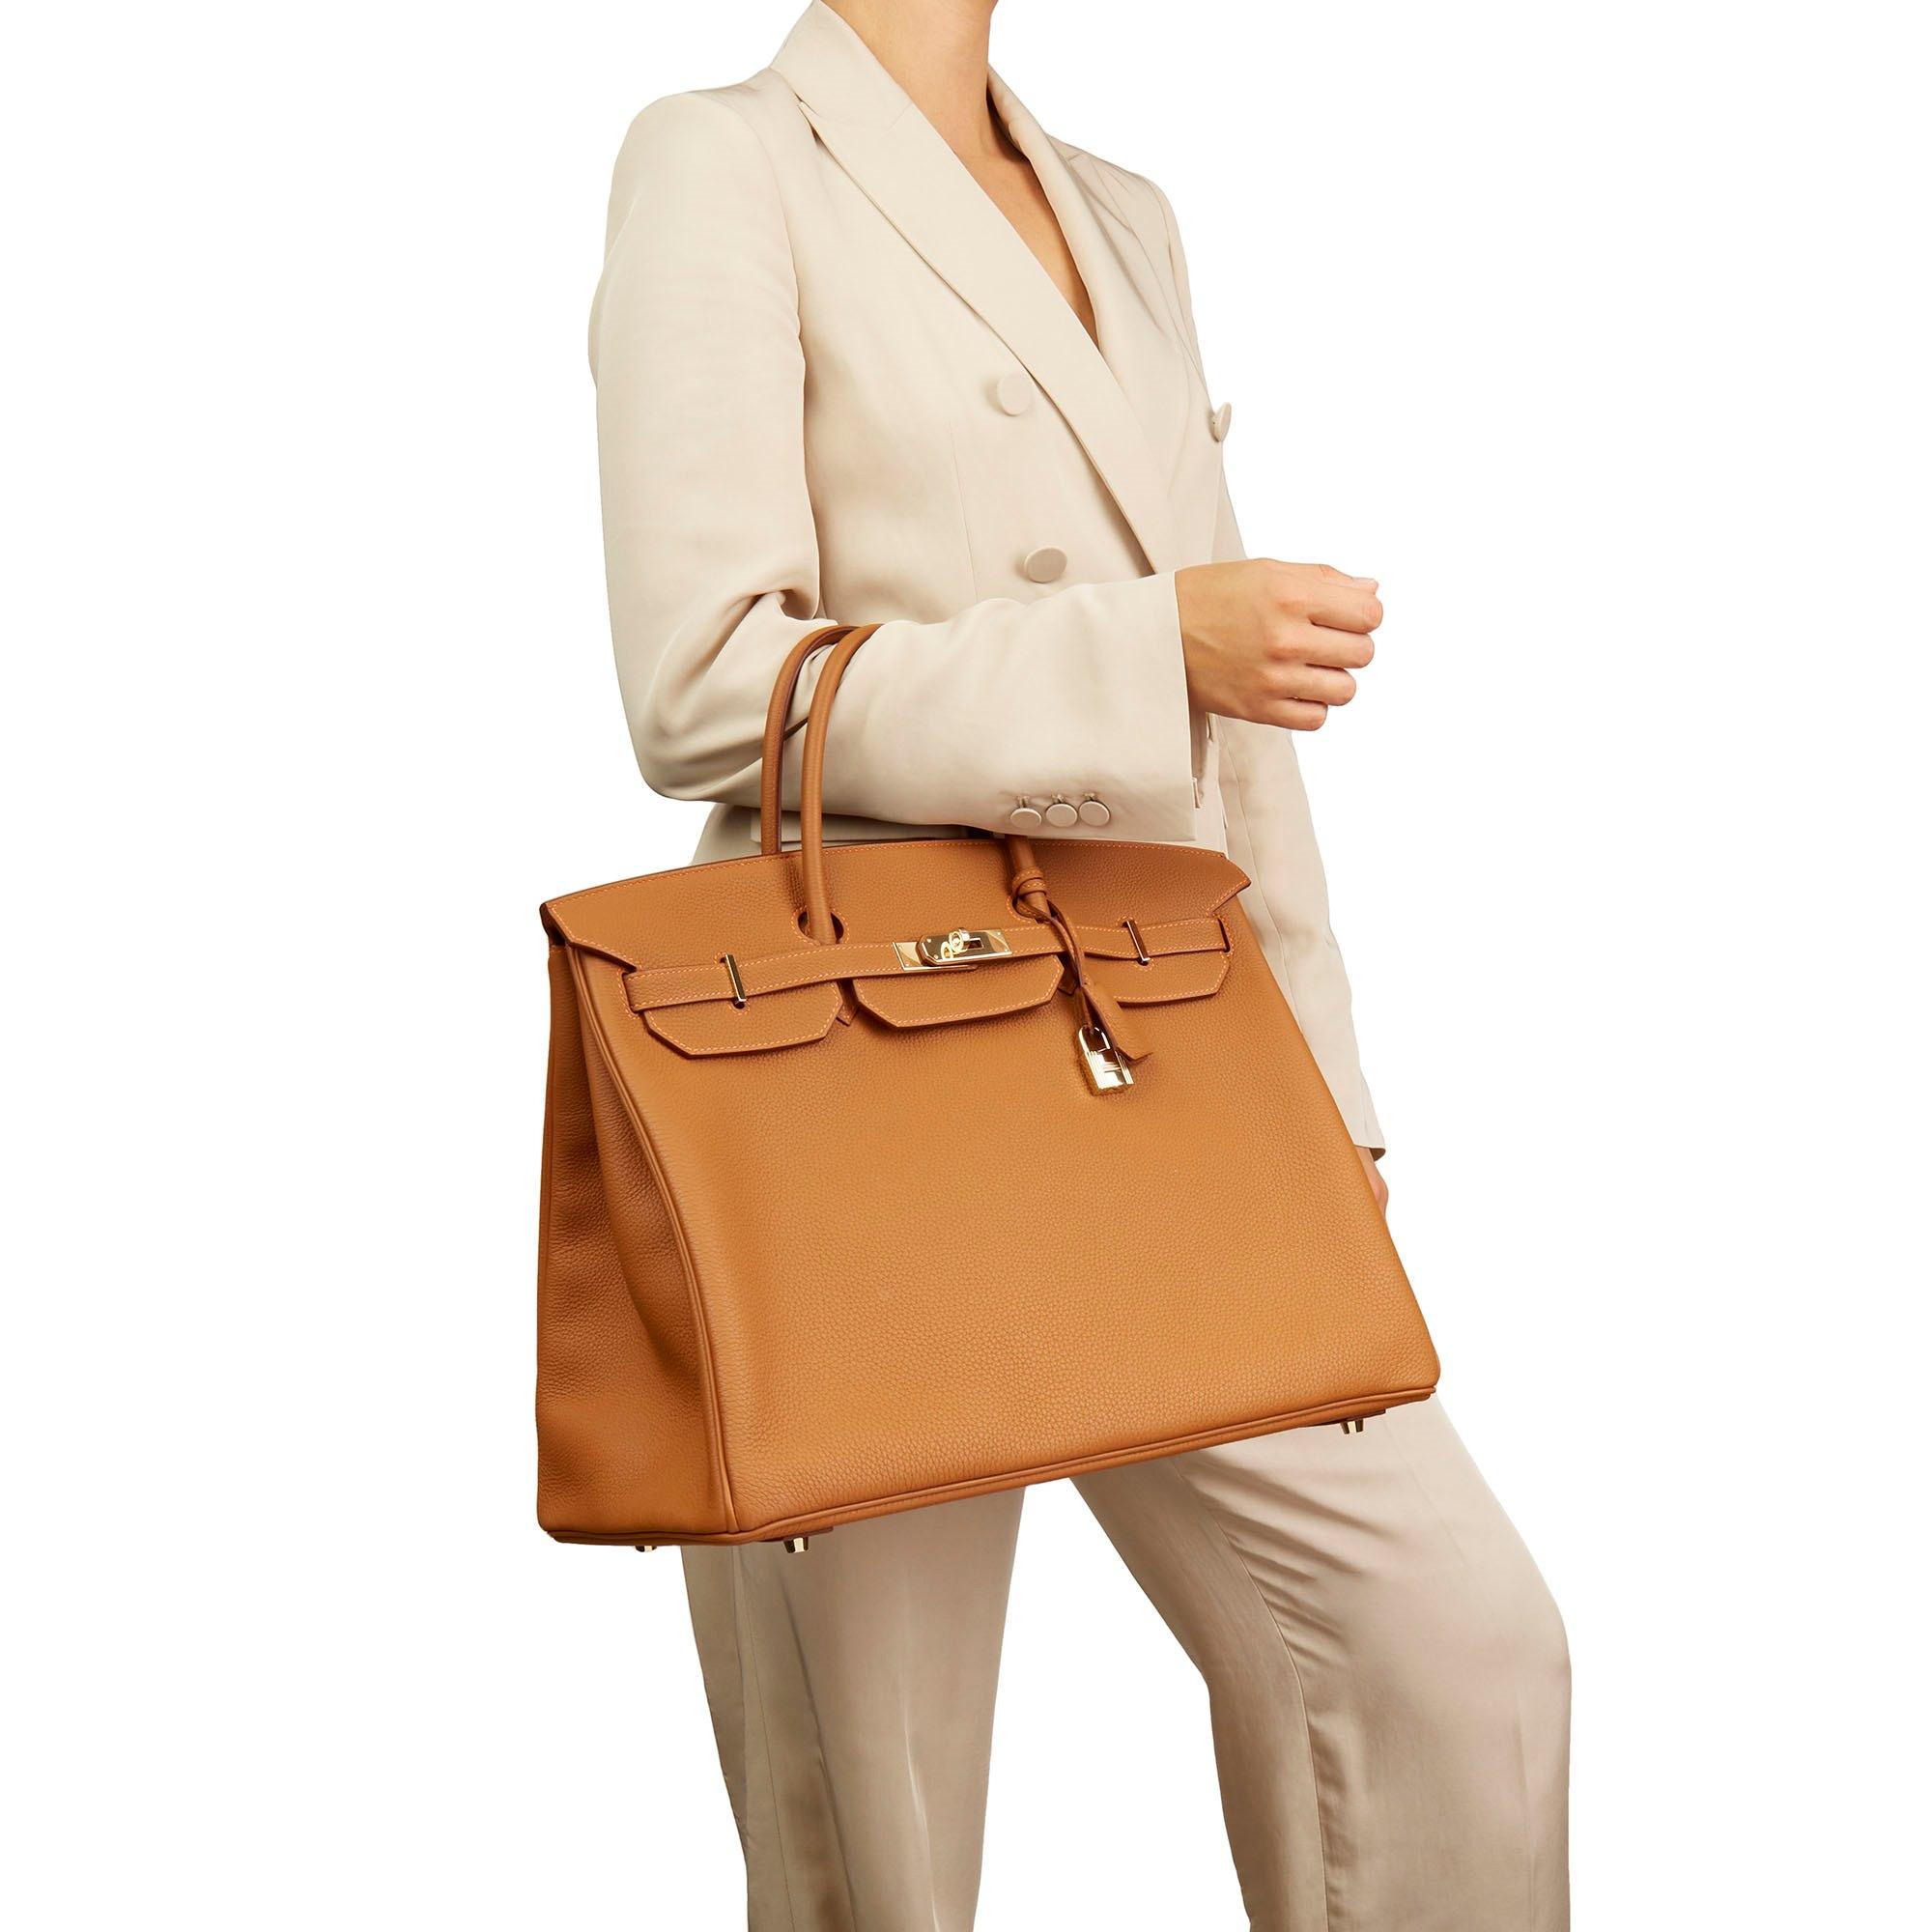 Hermès Gold Togo Leather Special Order Birkin 40cm